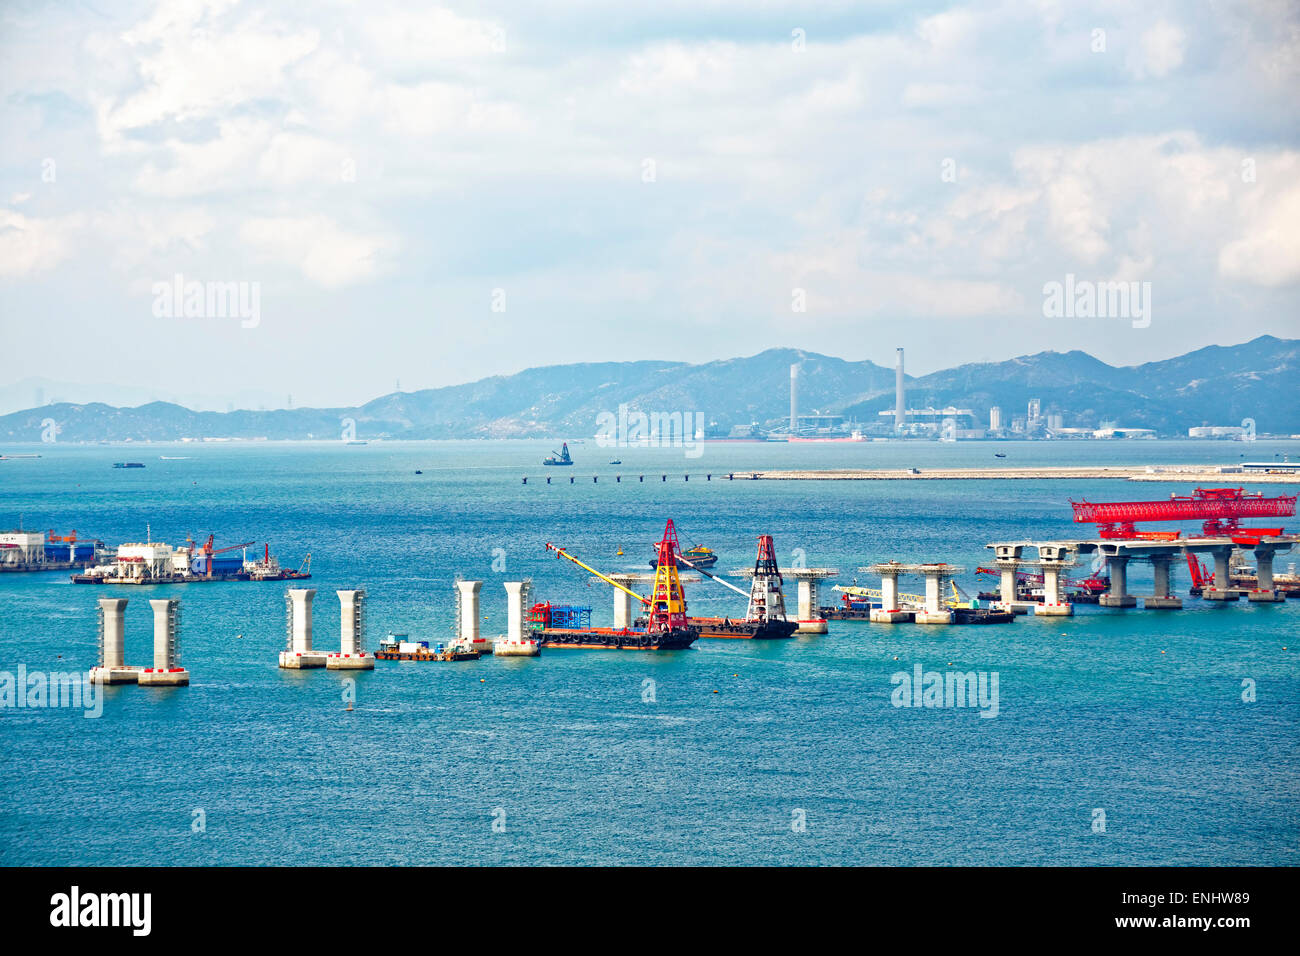 construction site of Hong Kong Zhuhai Macau Macao Bridge at day - Stock Image